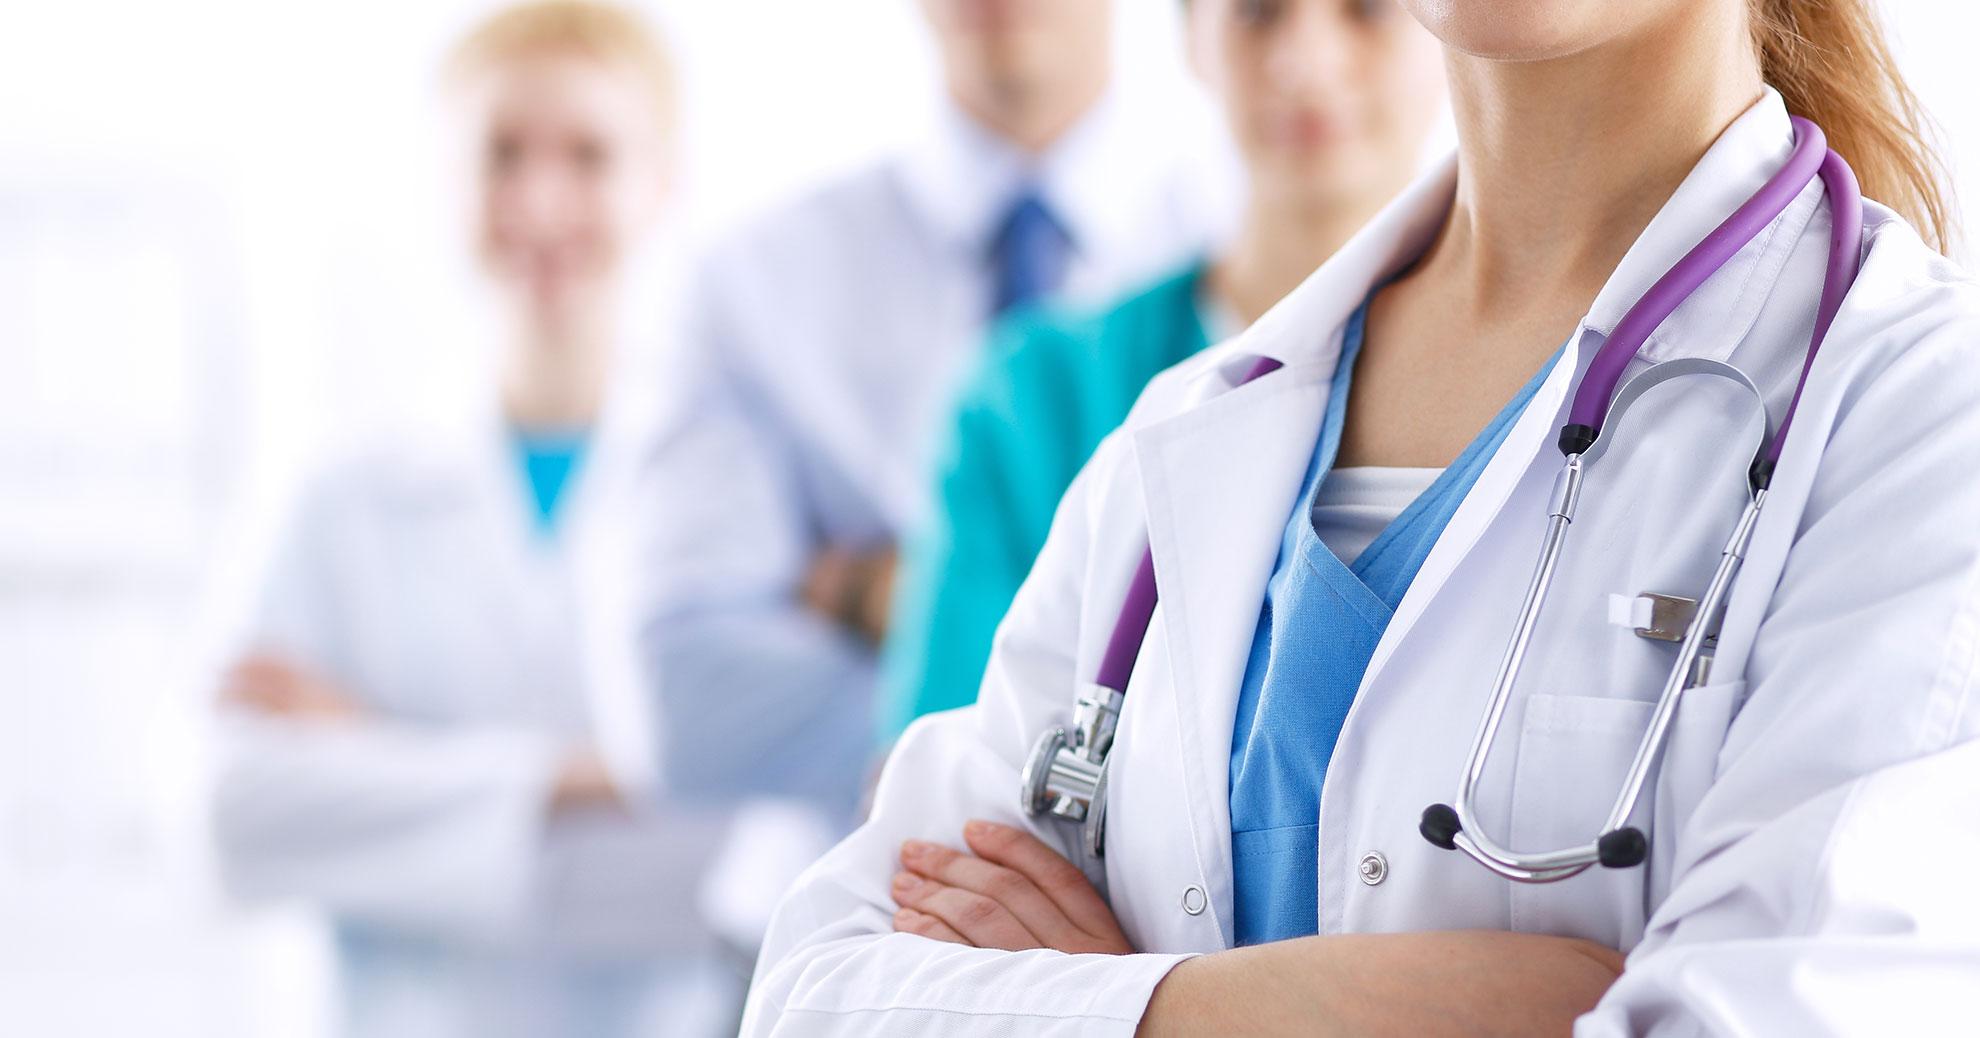 Chronic Pain Solution at Lilavati Hospital Held by Prabodh Mehta